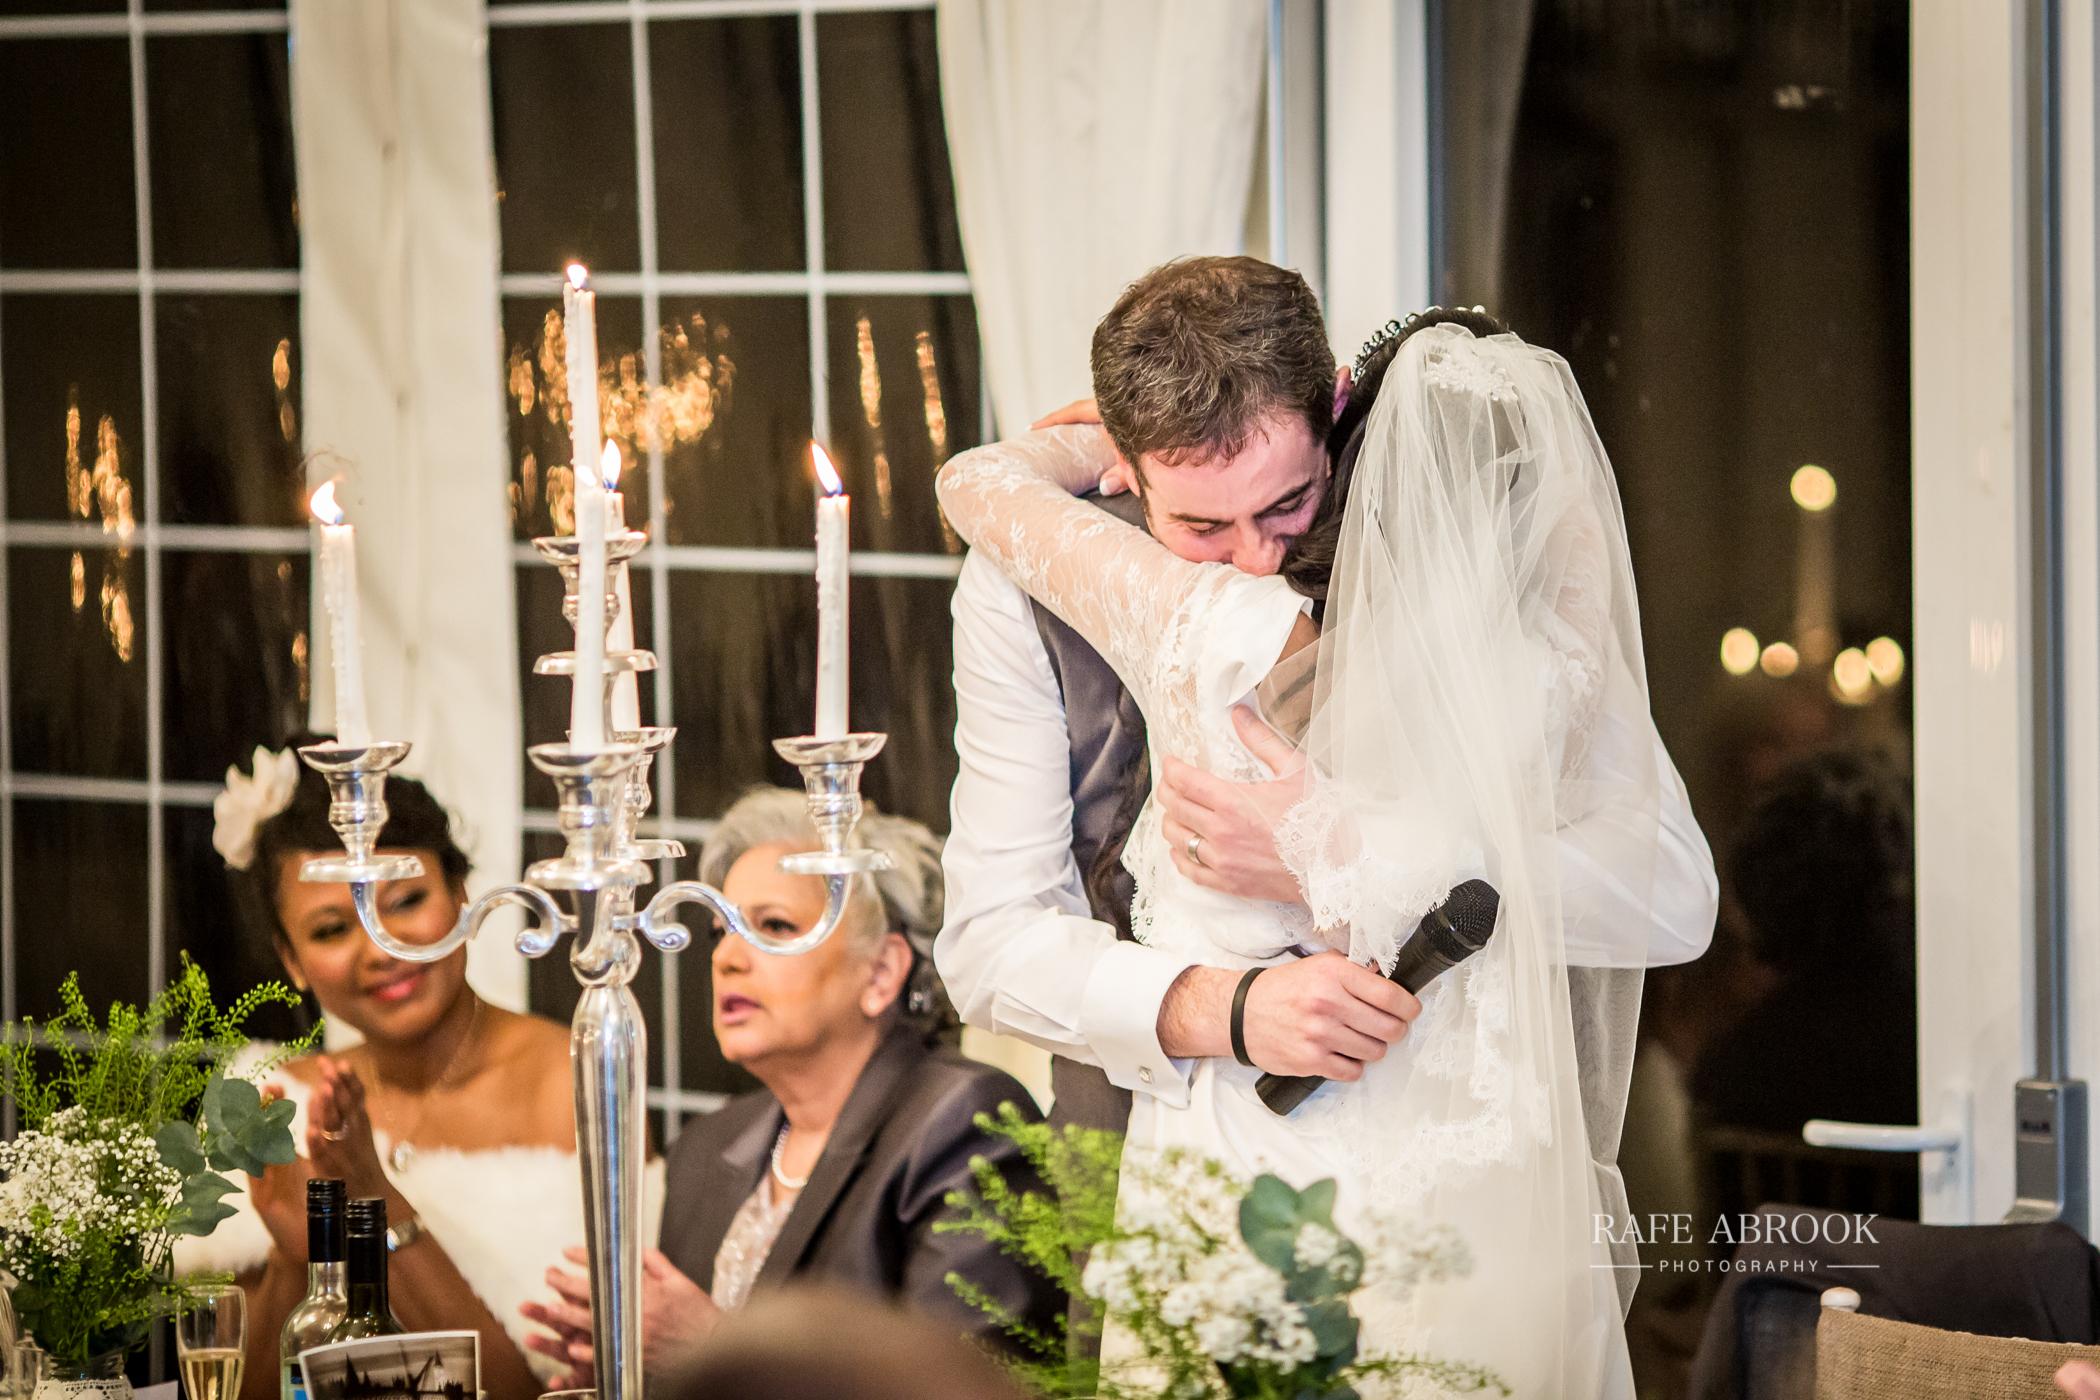 roma & pete wedding hampstead shenley hertfordshire -440.jpg